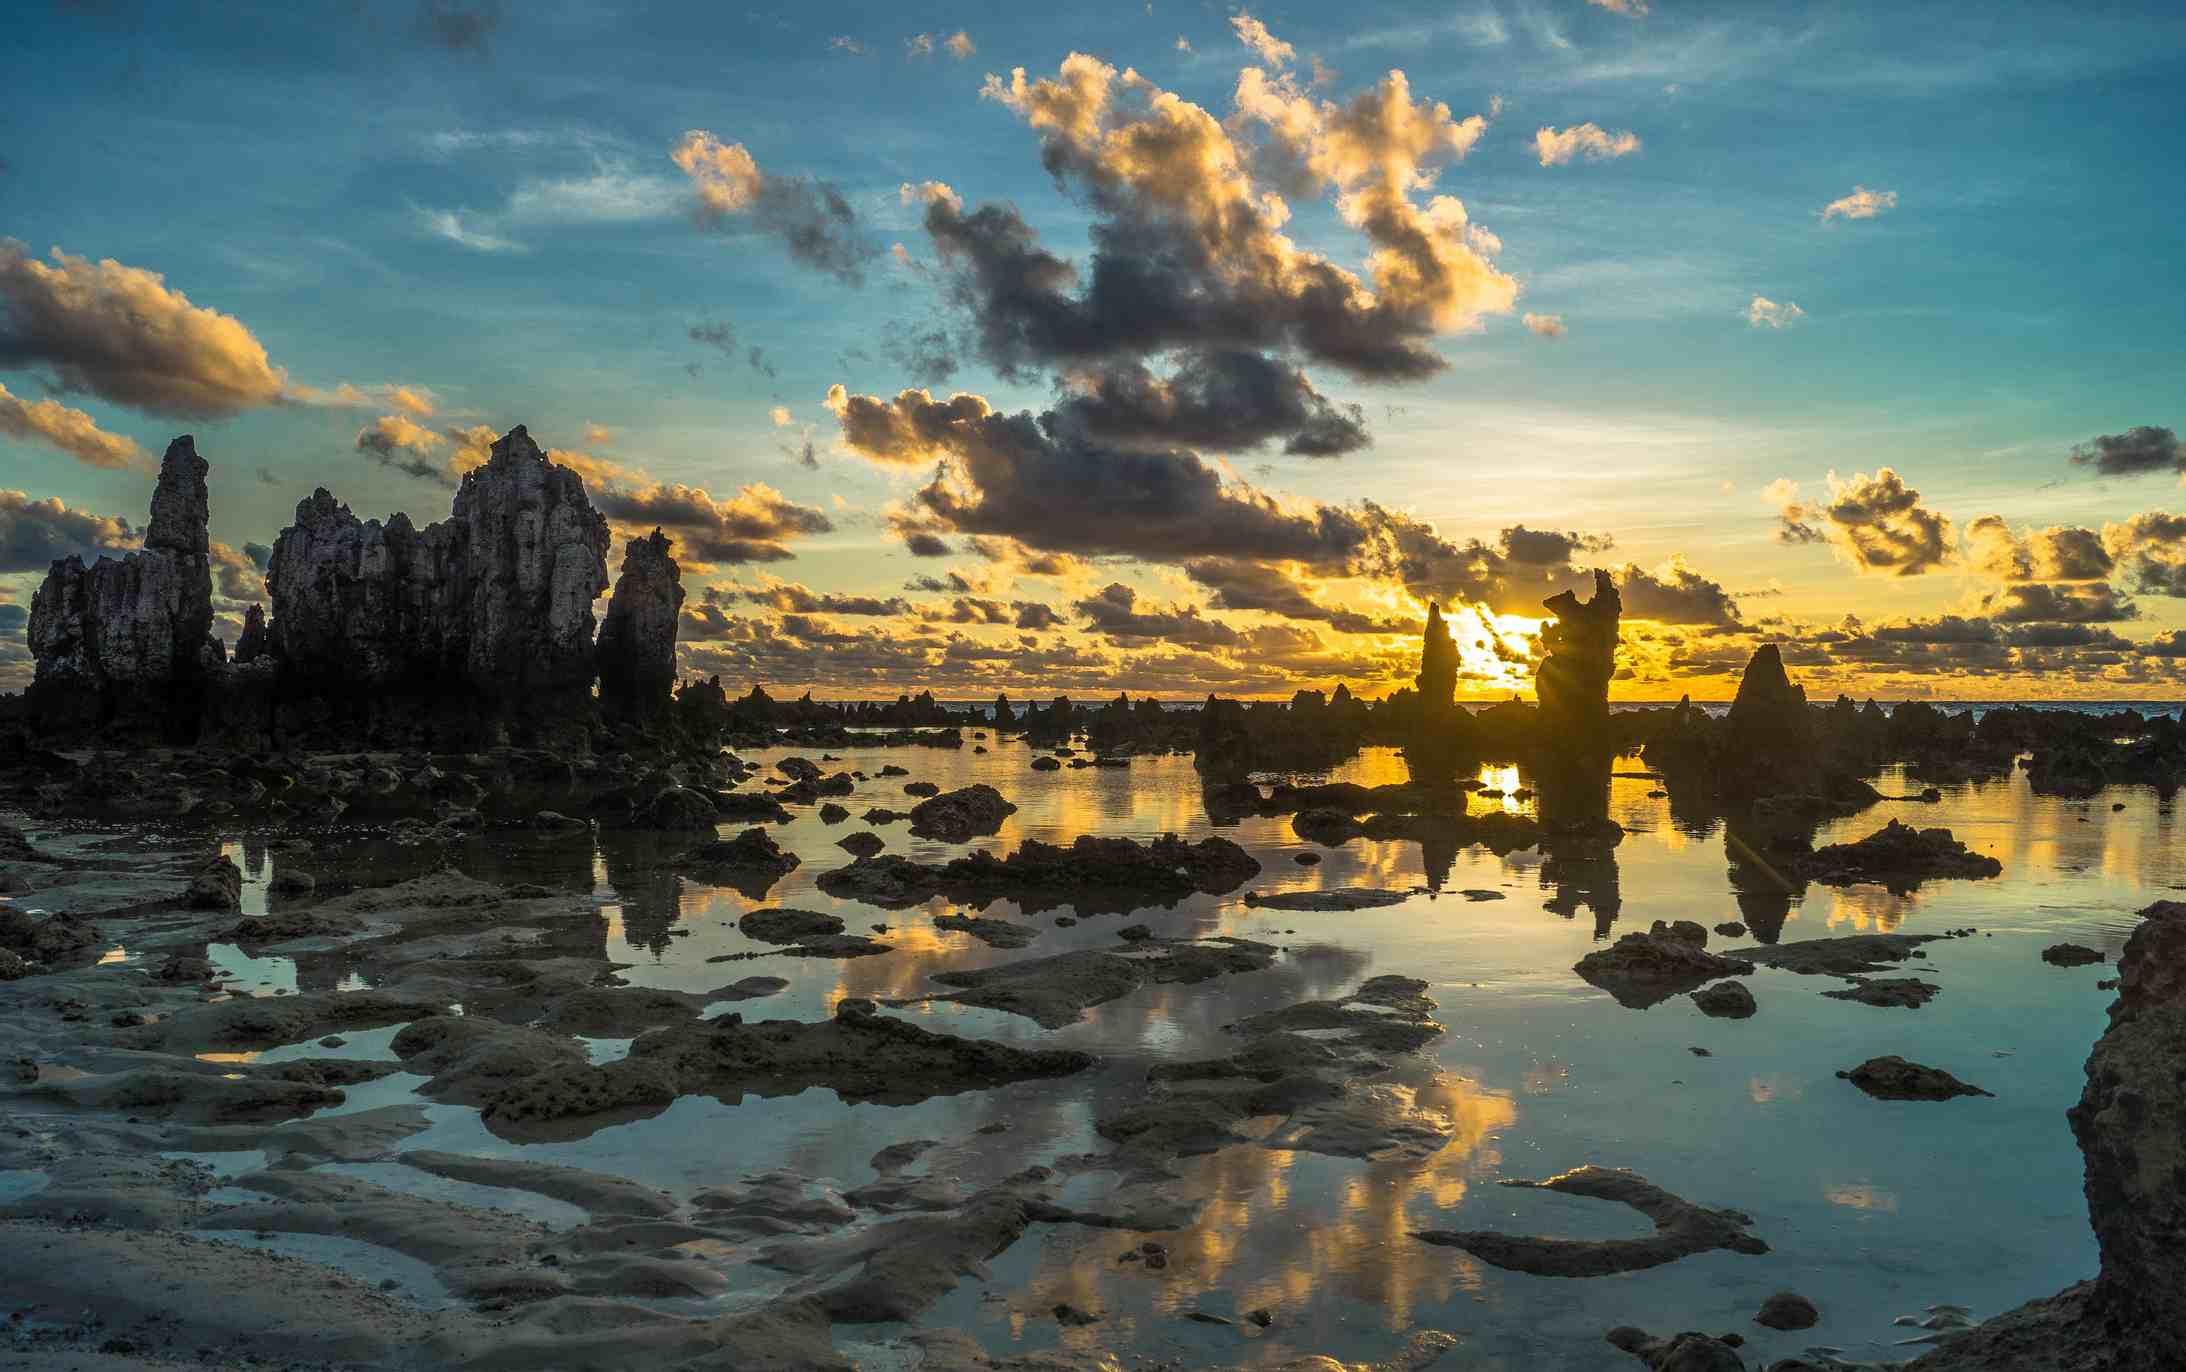 The Sun rises among the rock pinnacles on Anabare beach, Nauru island, South Pacific.